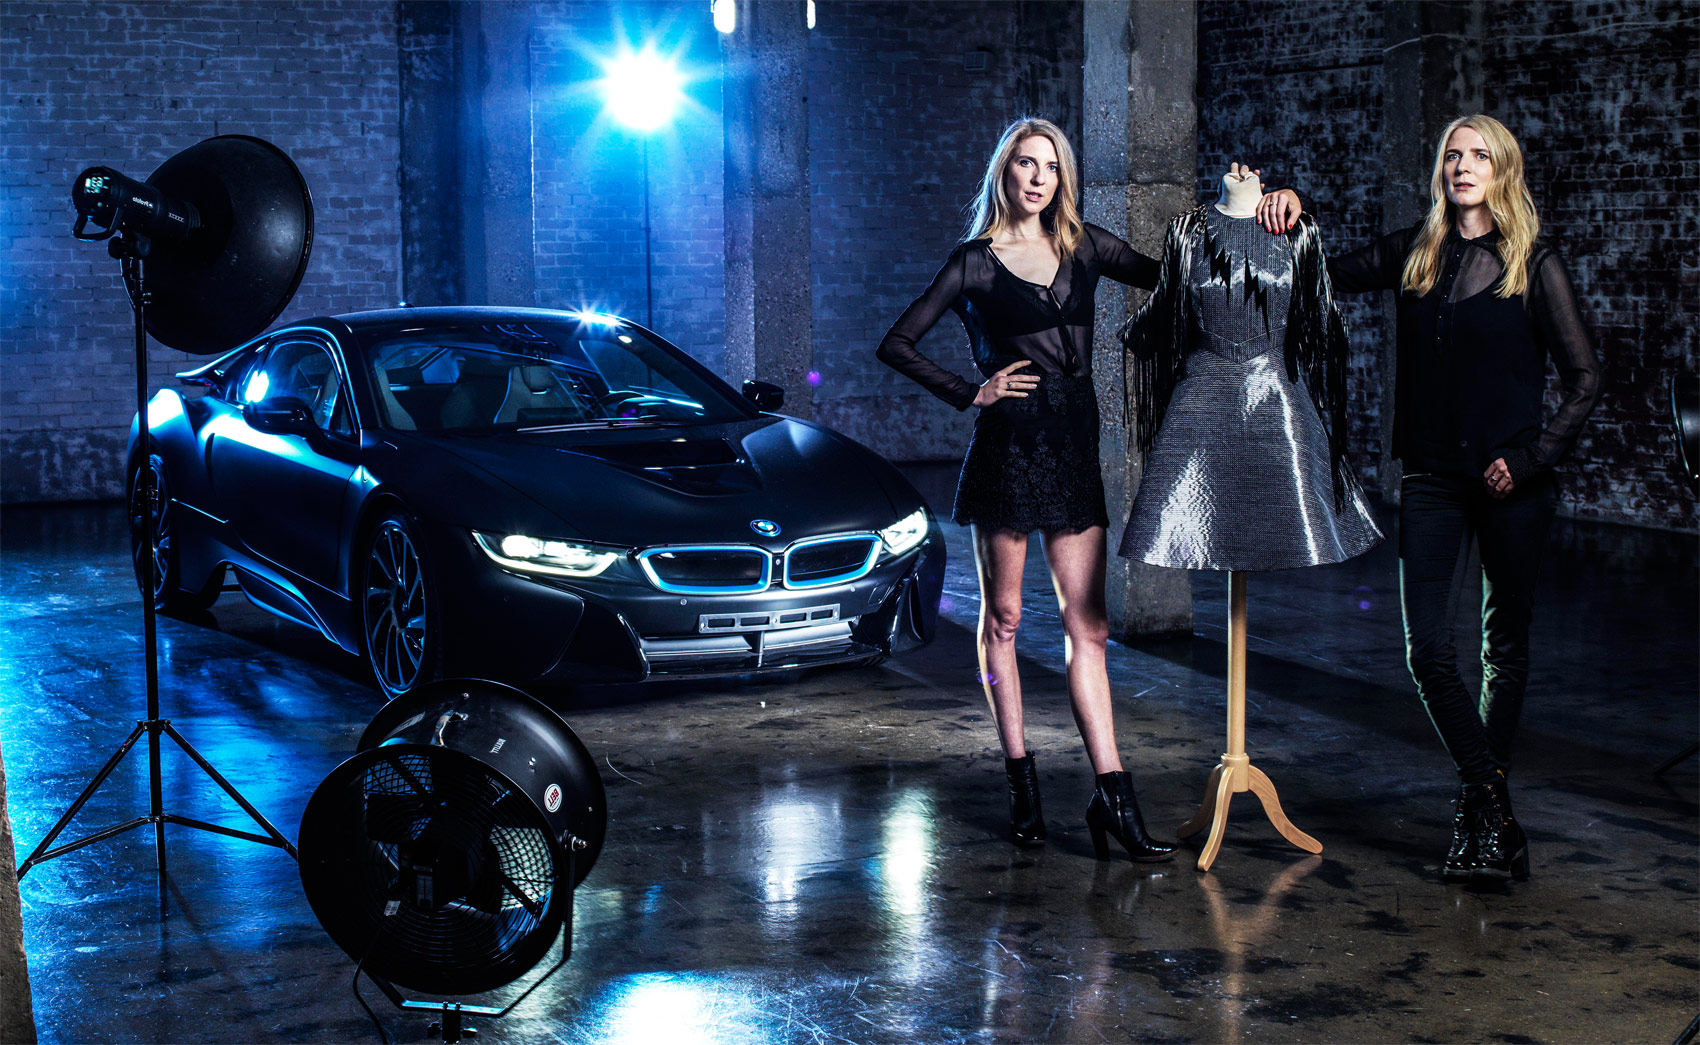 Fashion Designers Felder Felder Unveil Sustainable Carbon Dress